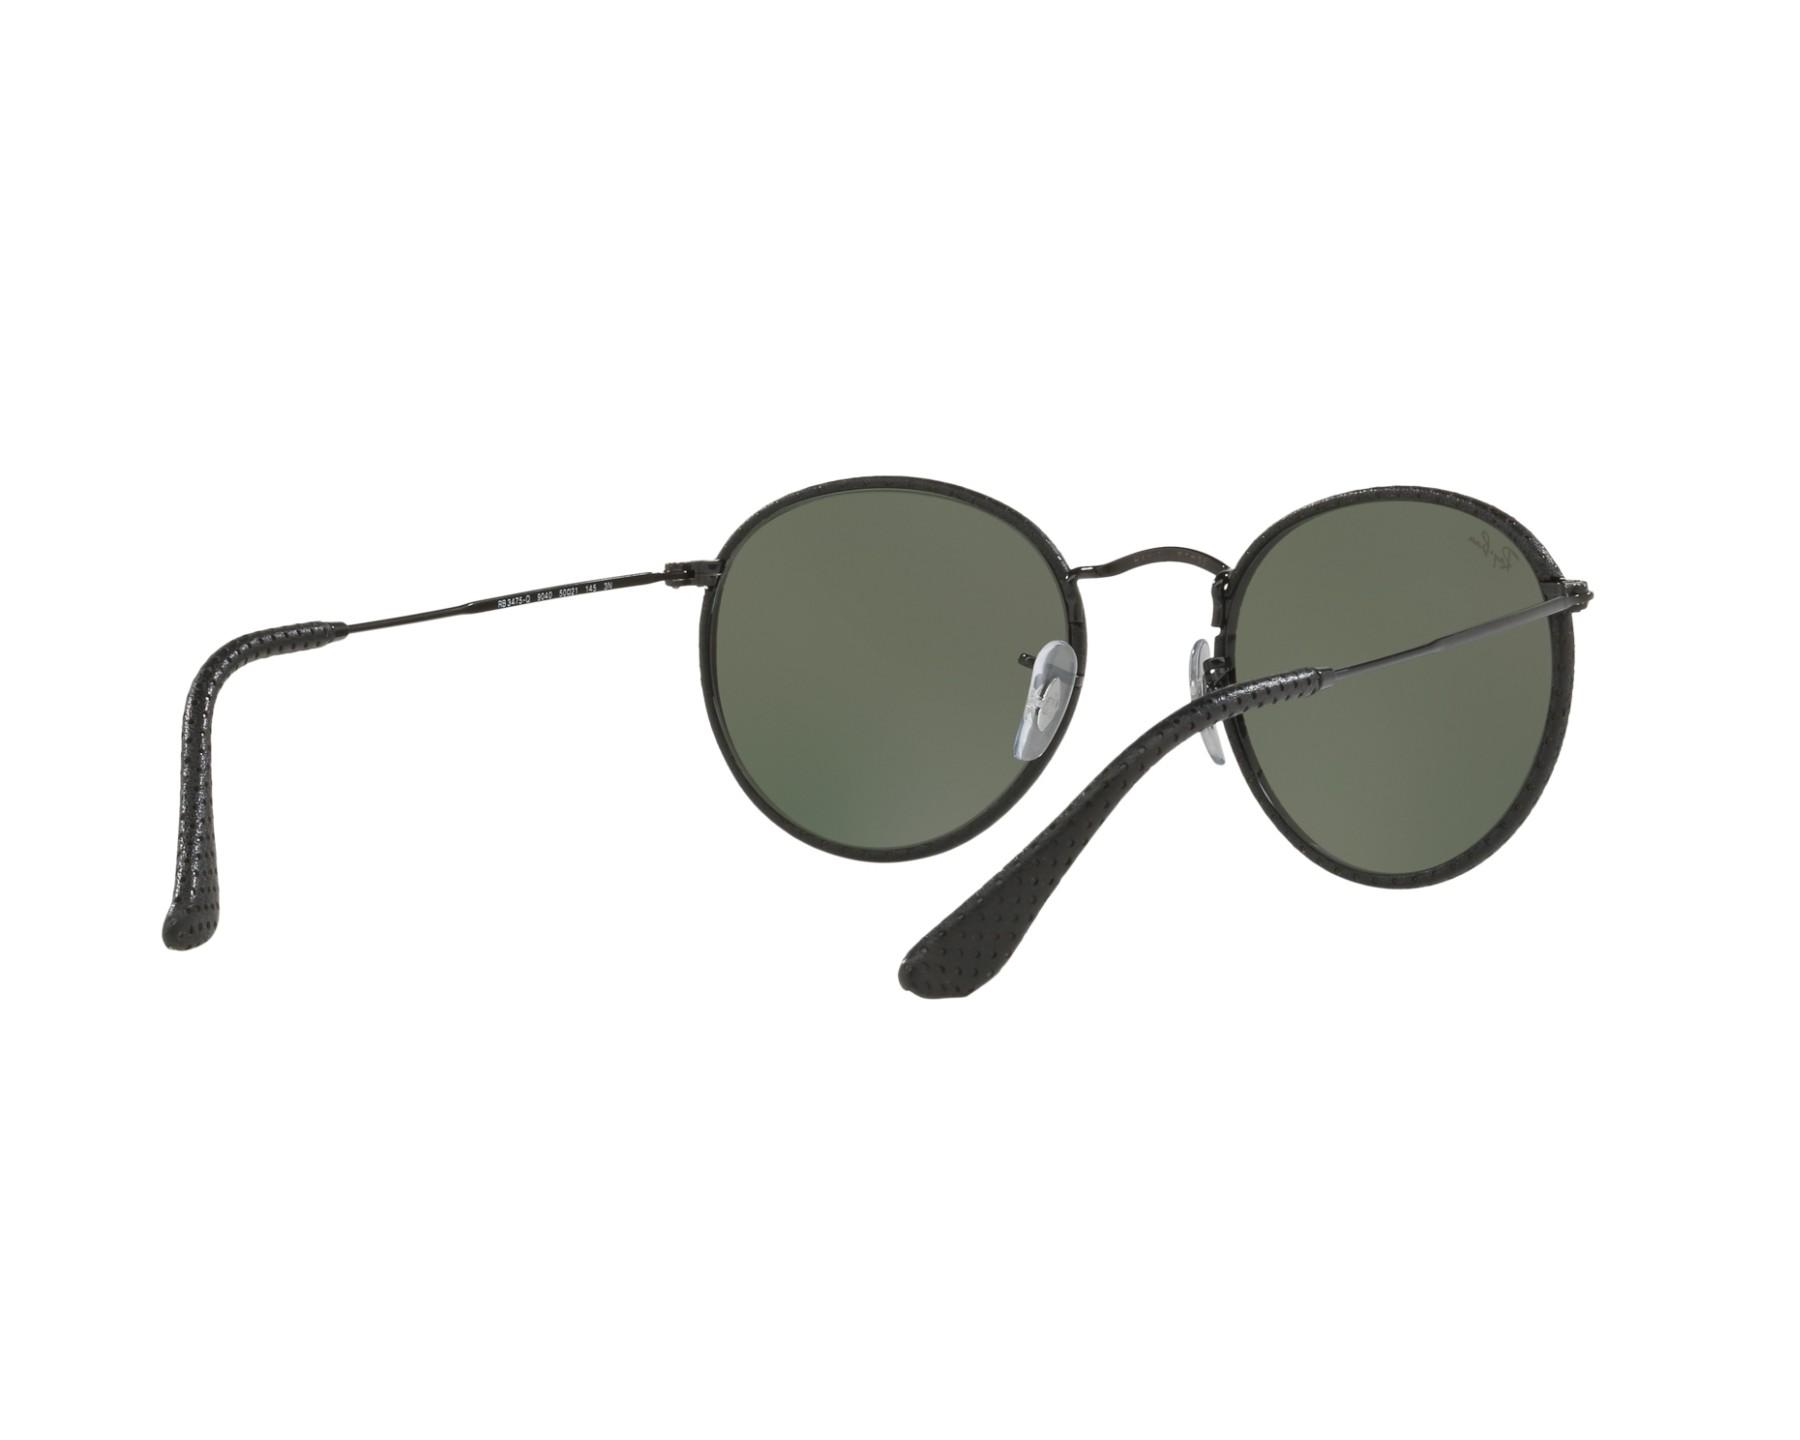 Ray Ban RB 3422-Q 9040 Sonnenbrille verglast VDYtrS